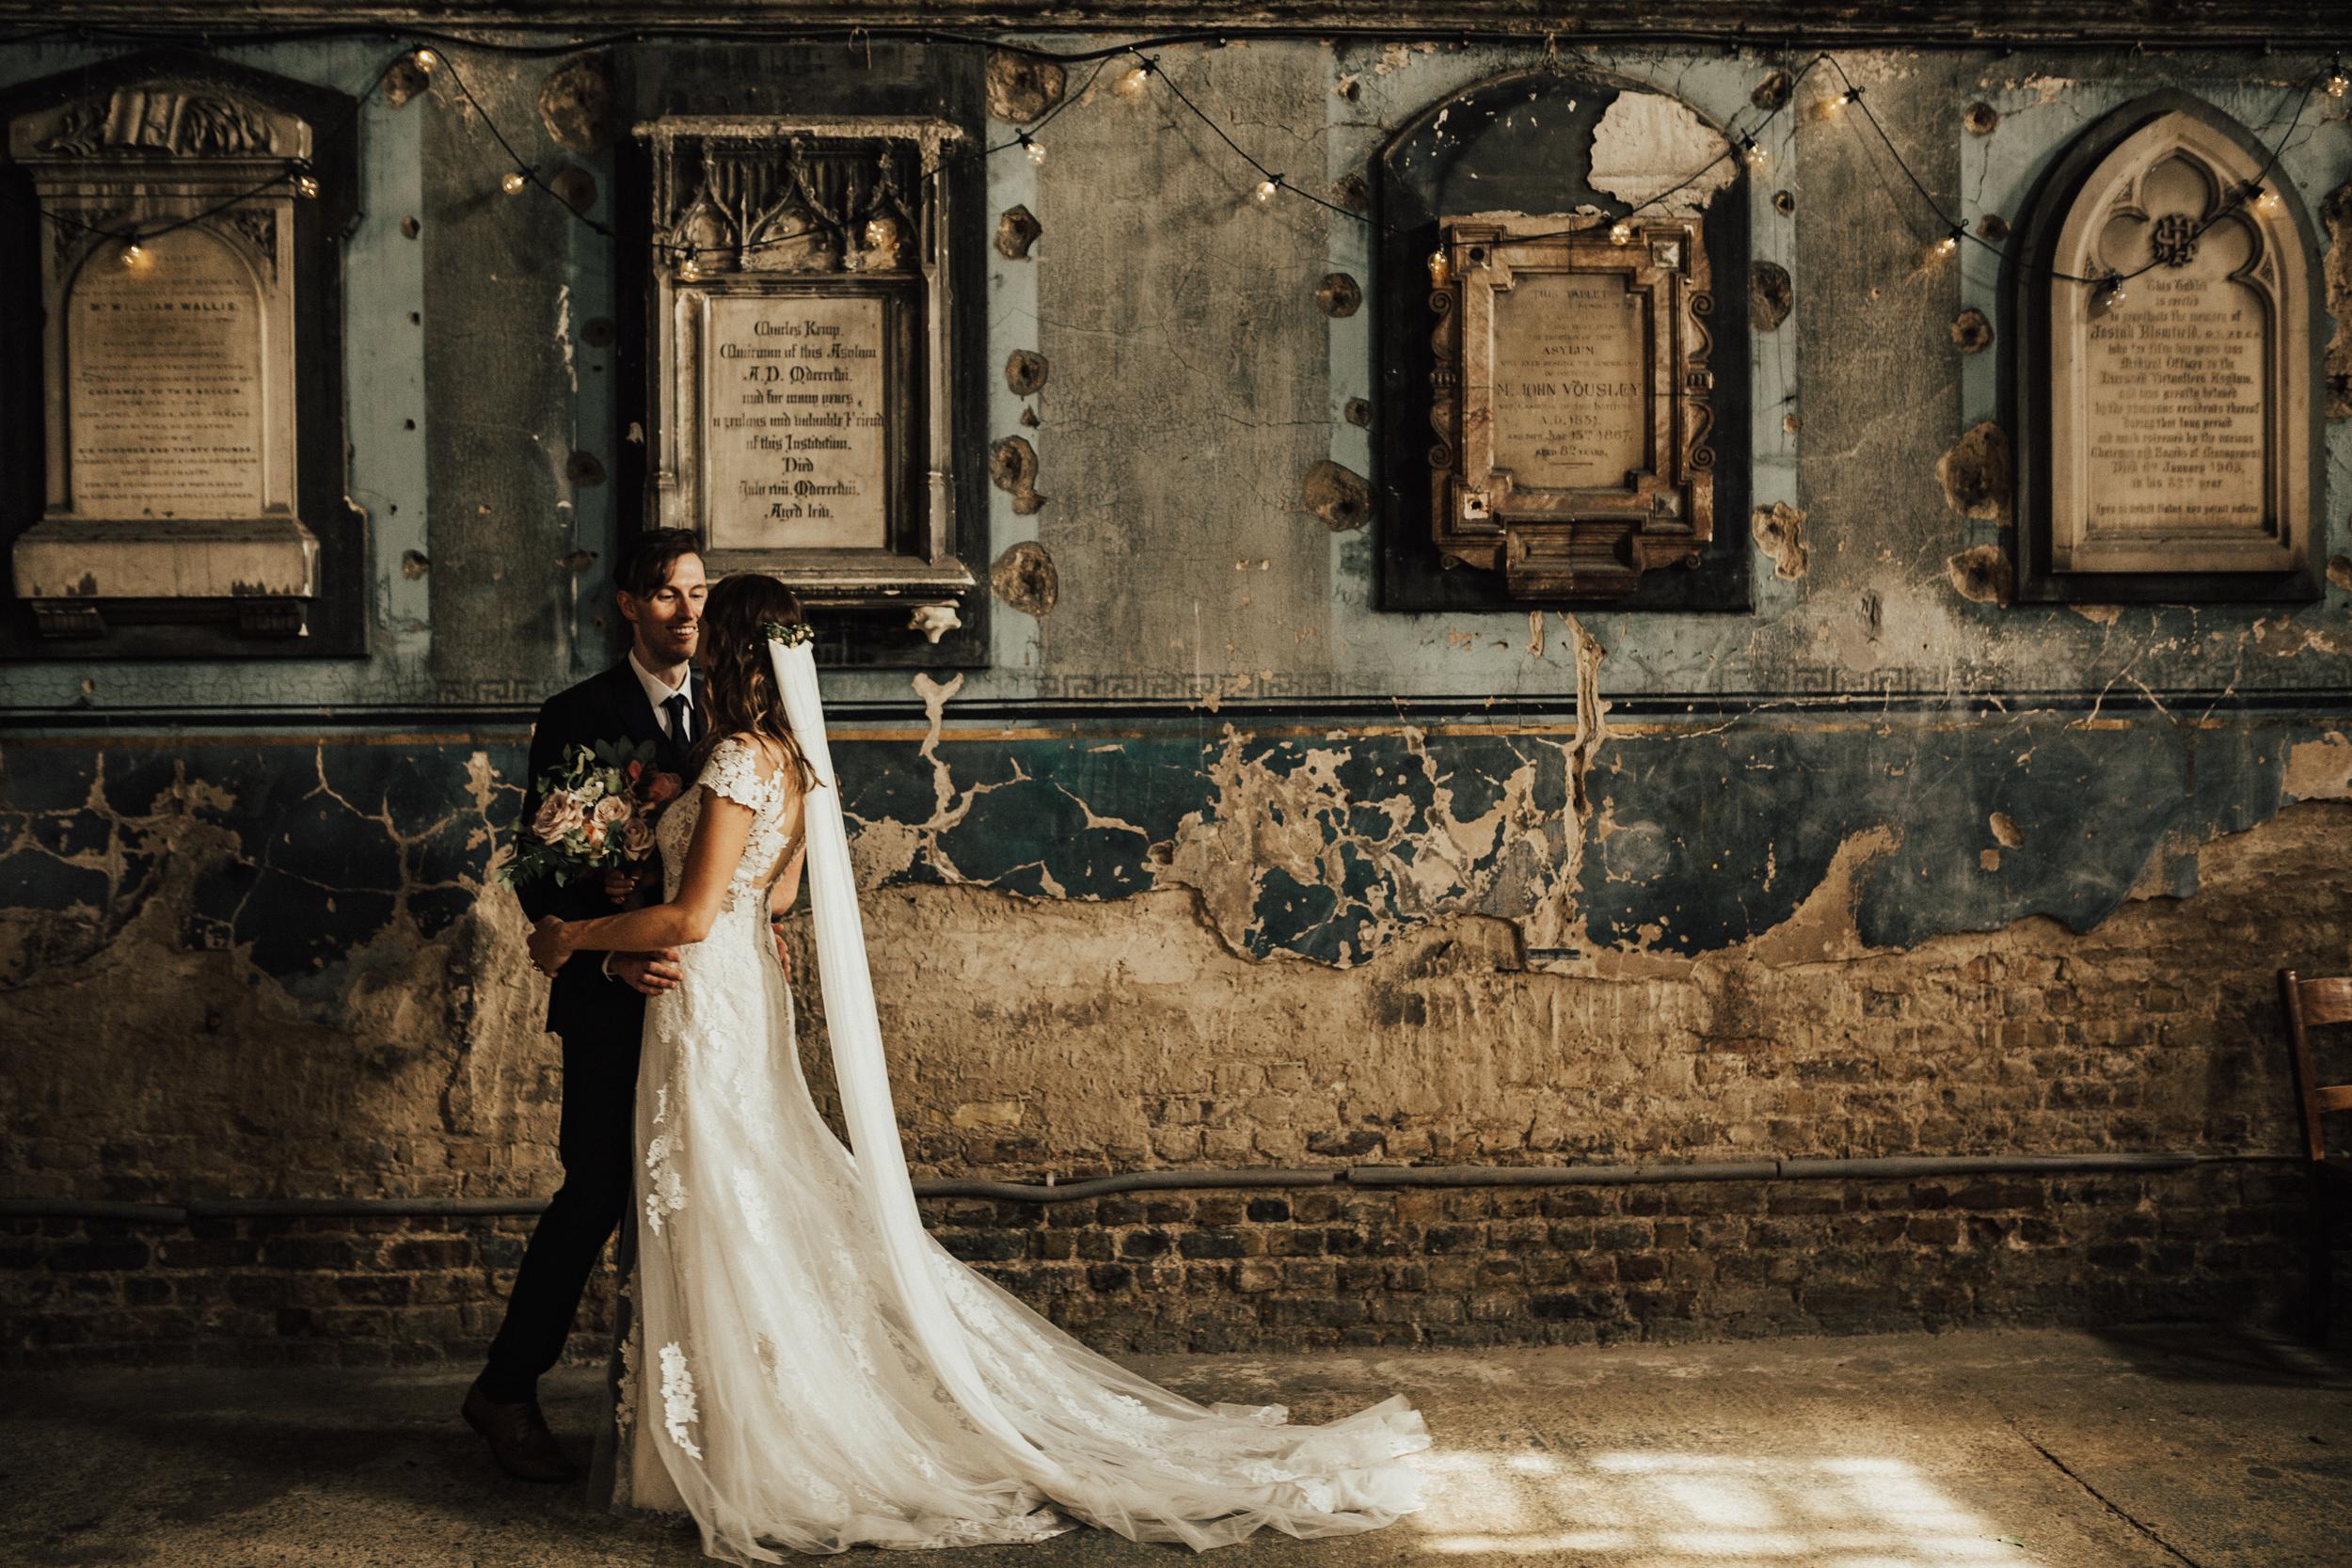 Laura-Benn-The-Asylum-London-The-Ace-Hotel-Wedding-Alternative-Darina-Stoda-Photography-334.jpg